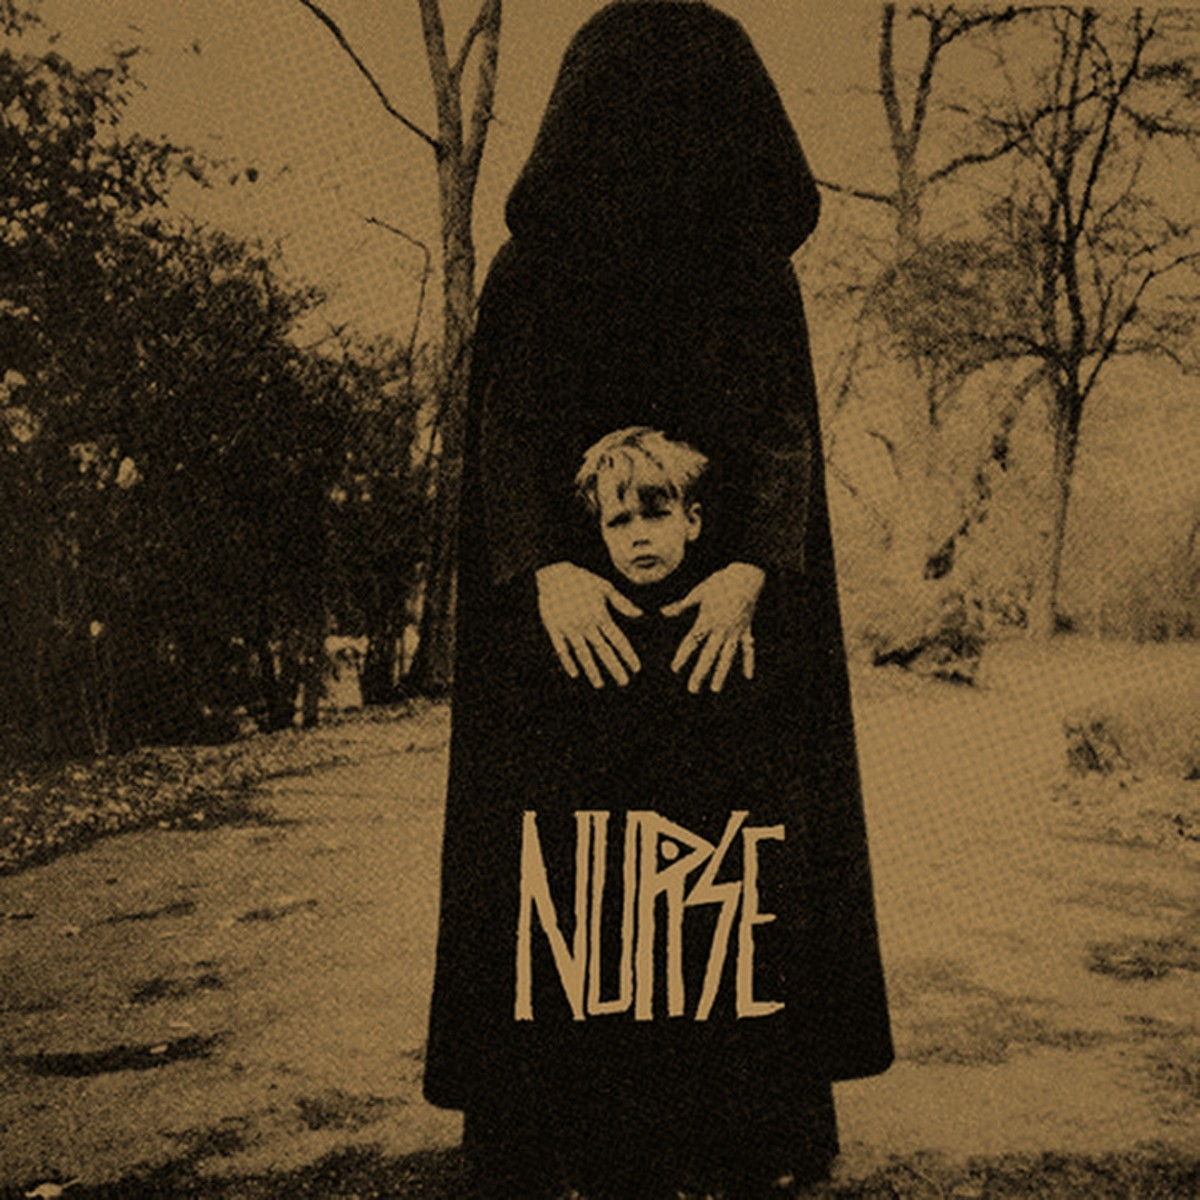 gal_nurse_st_7.jpeg.jpg